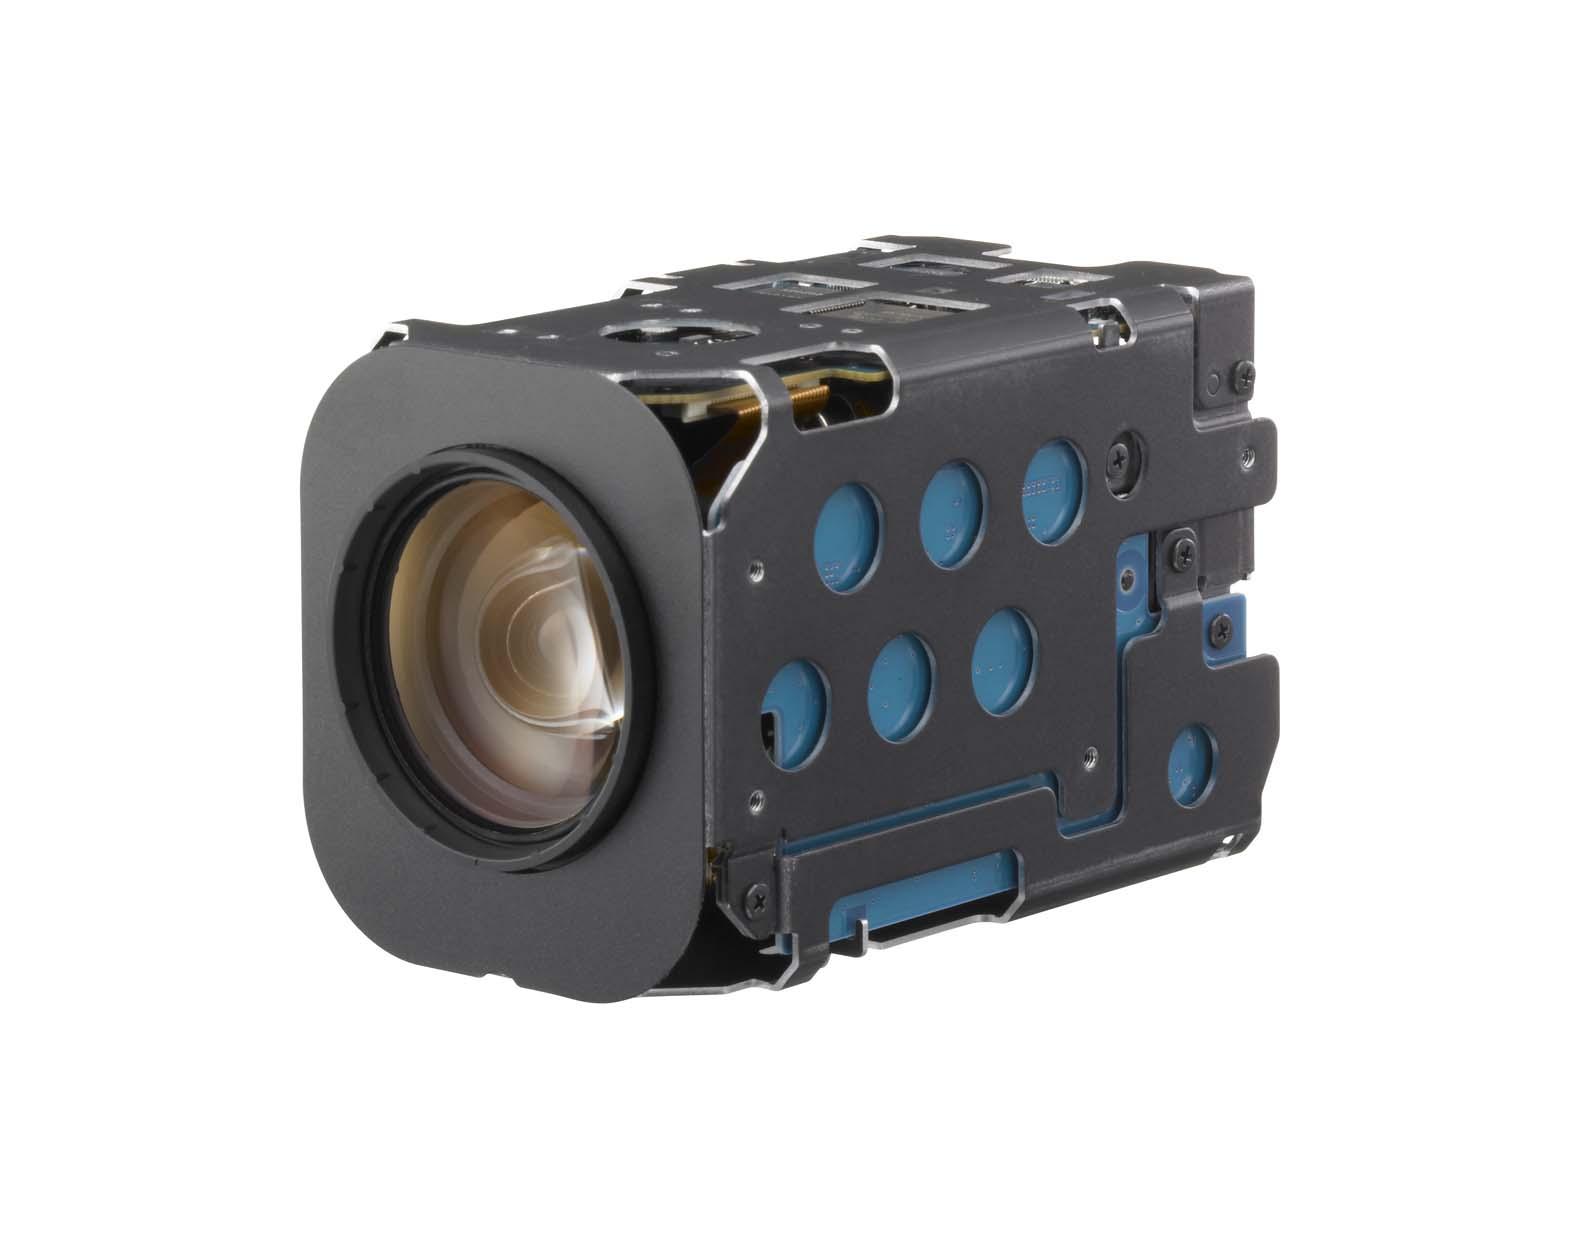 1/4 Sony FCB-EX1000P Color CCD Camera